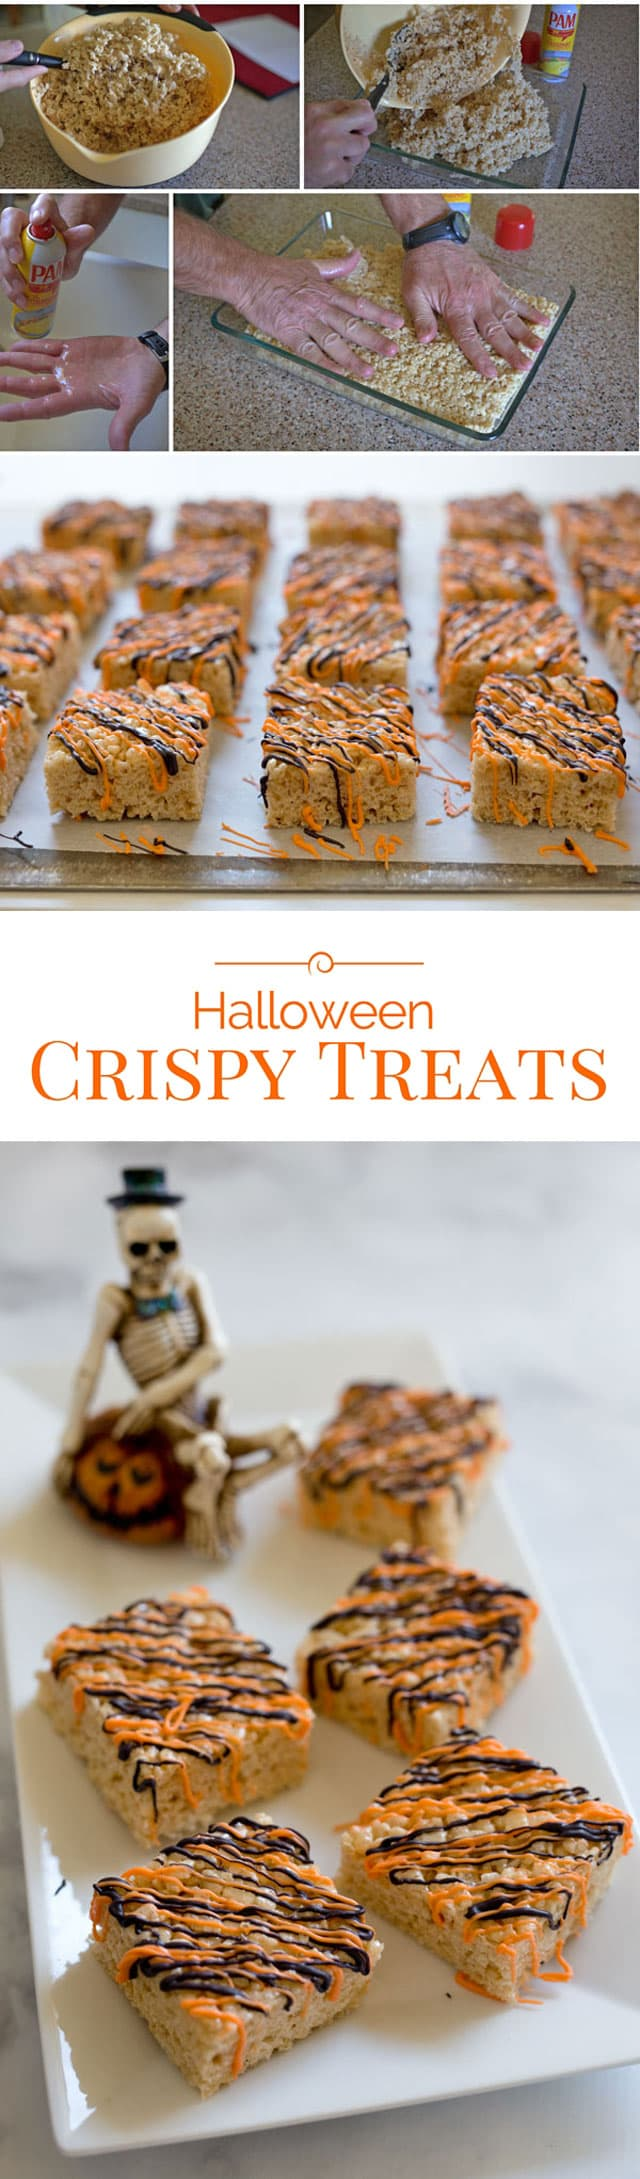 Halloween-Crispy-Treats-Collage-4-Barbara-Bakes